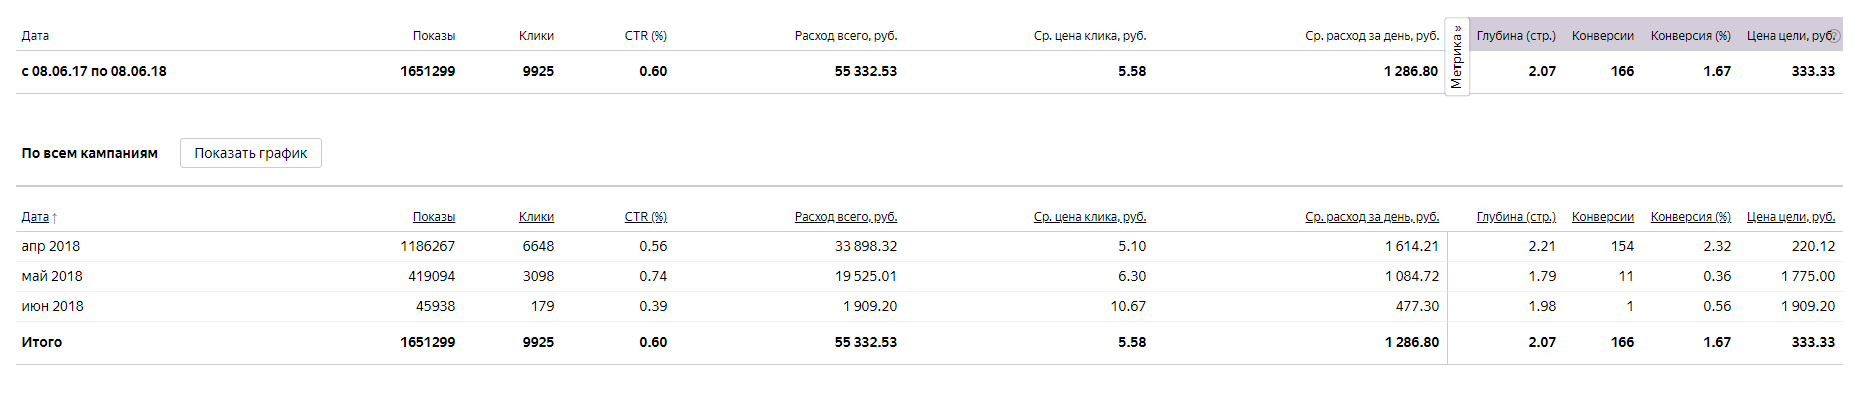 Yandex.Direct - tse-tele.ru